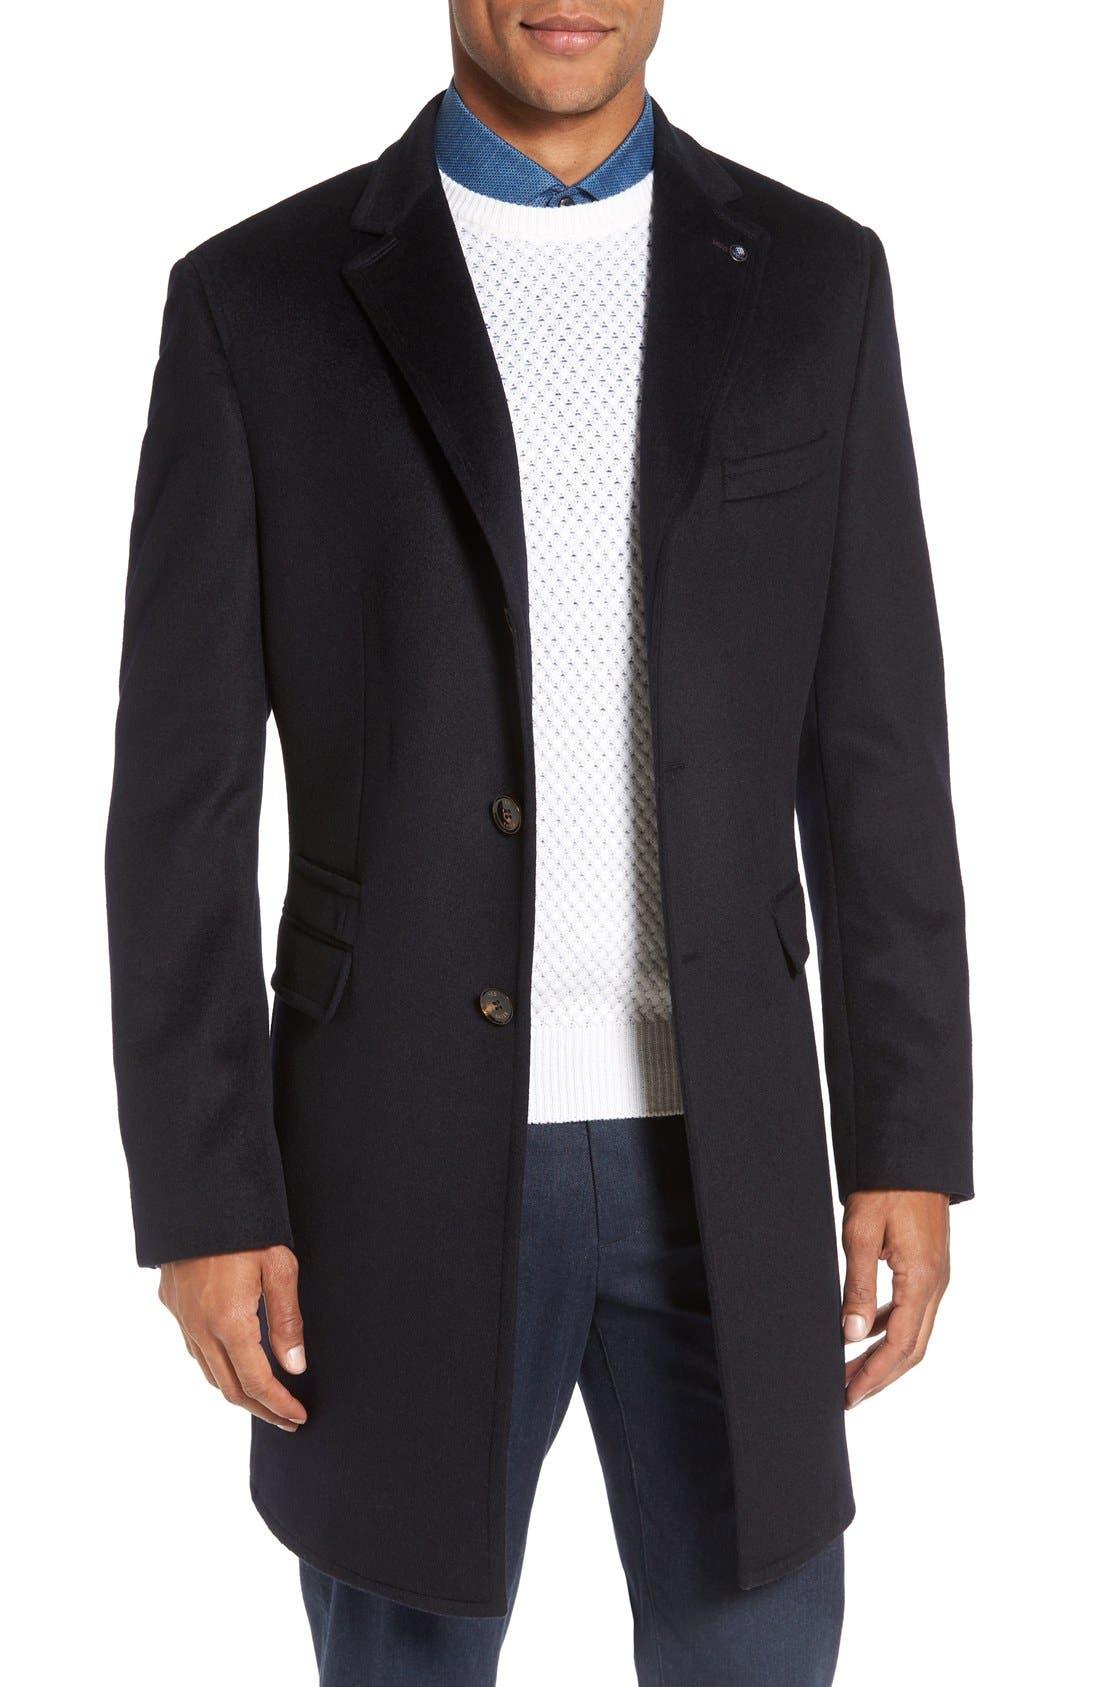 Main Image - Ted Baker London Alaska Trim Fit Wool & Cashmere Overcoat